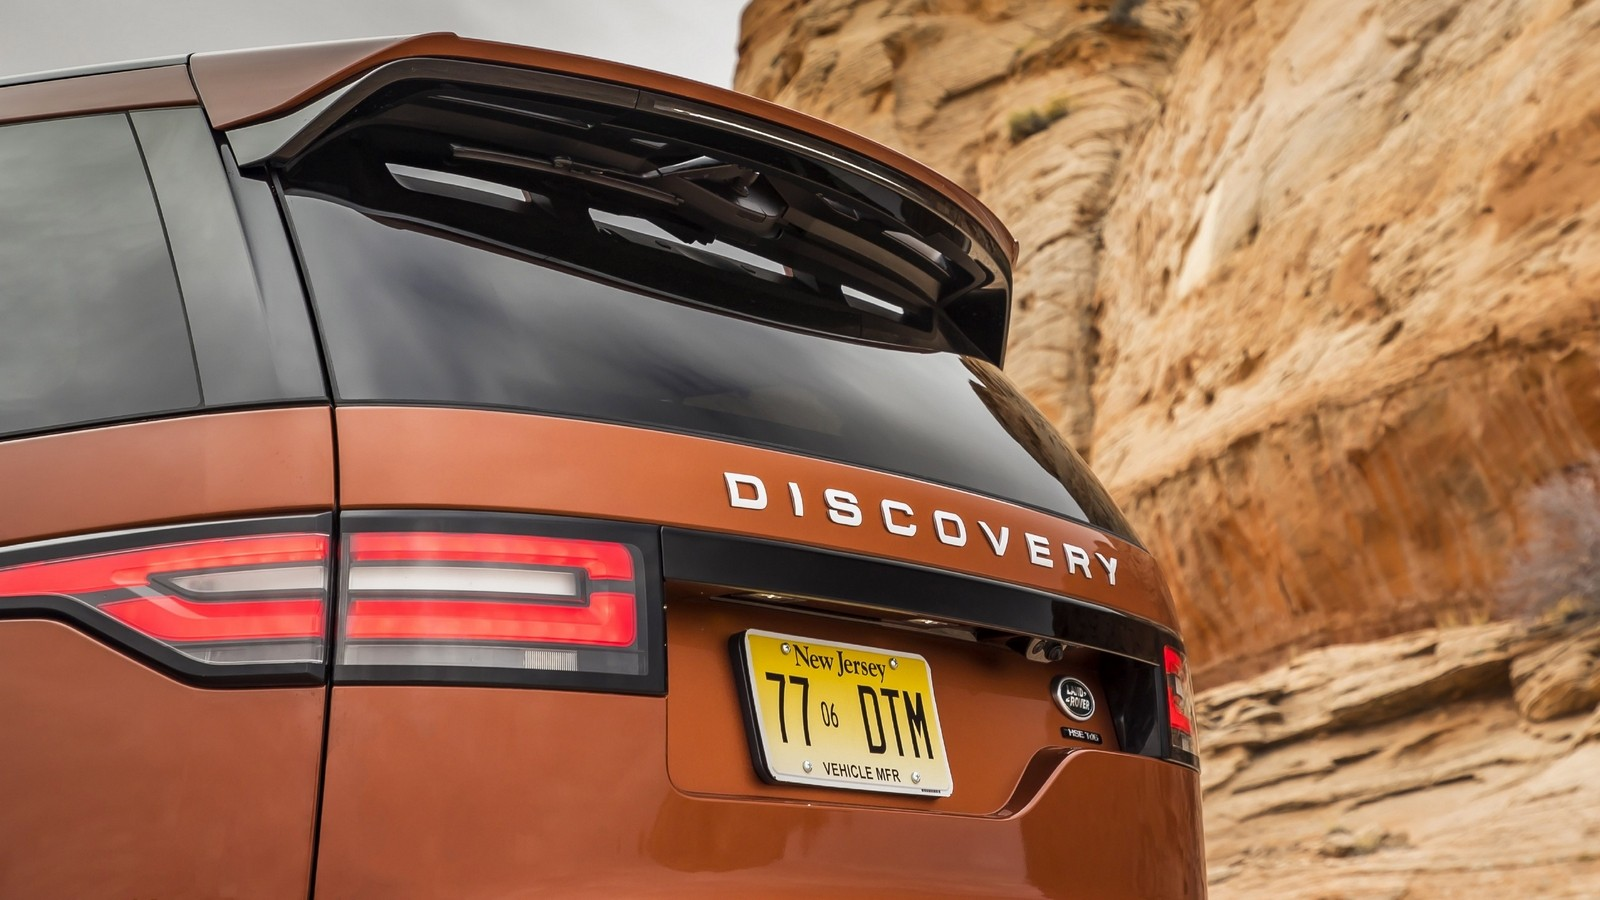 Discovery Namib Orange_325